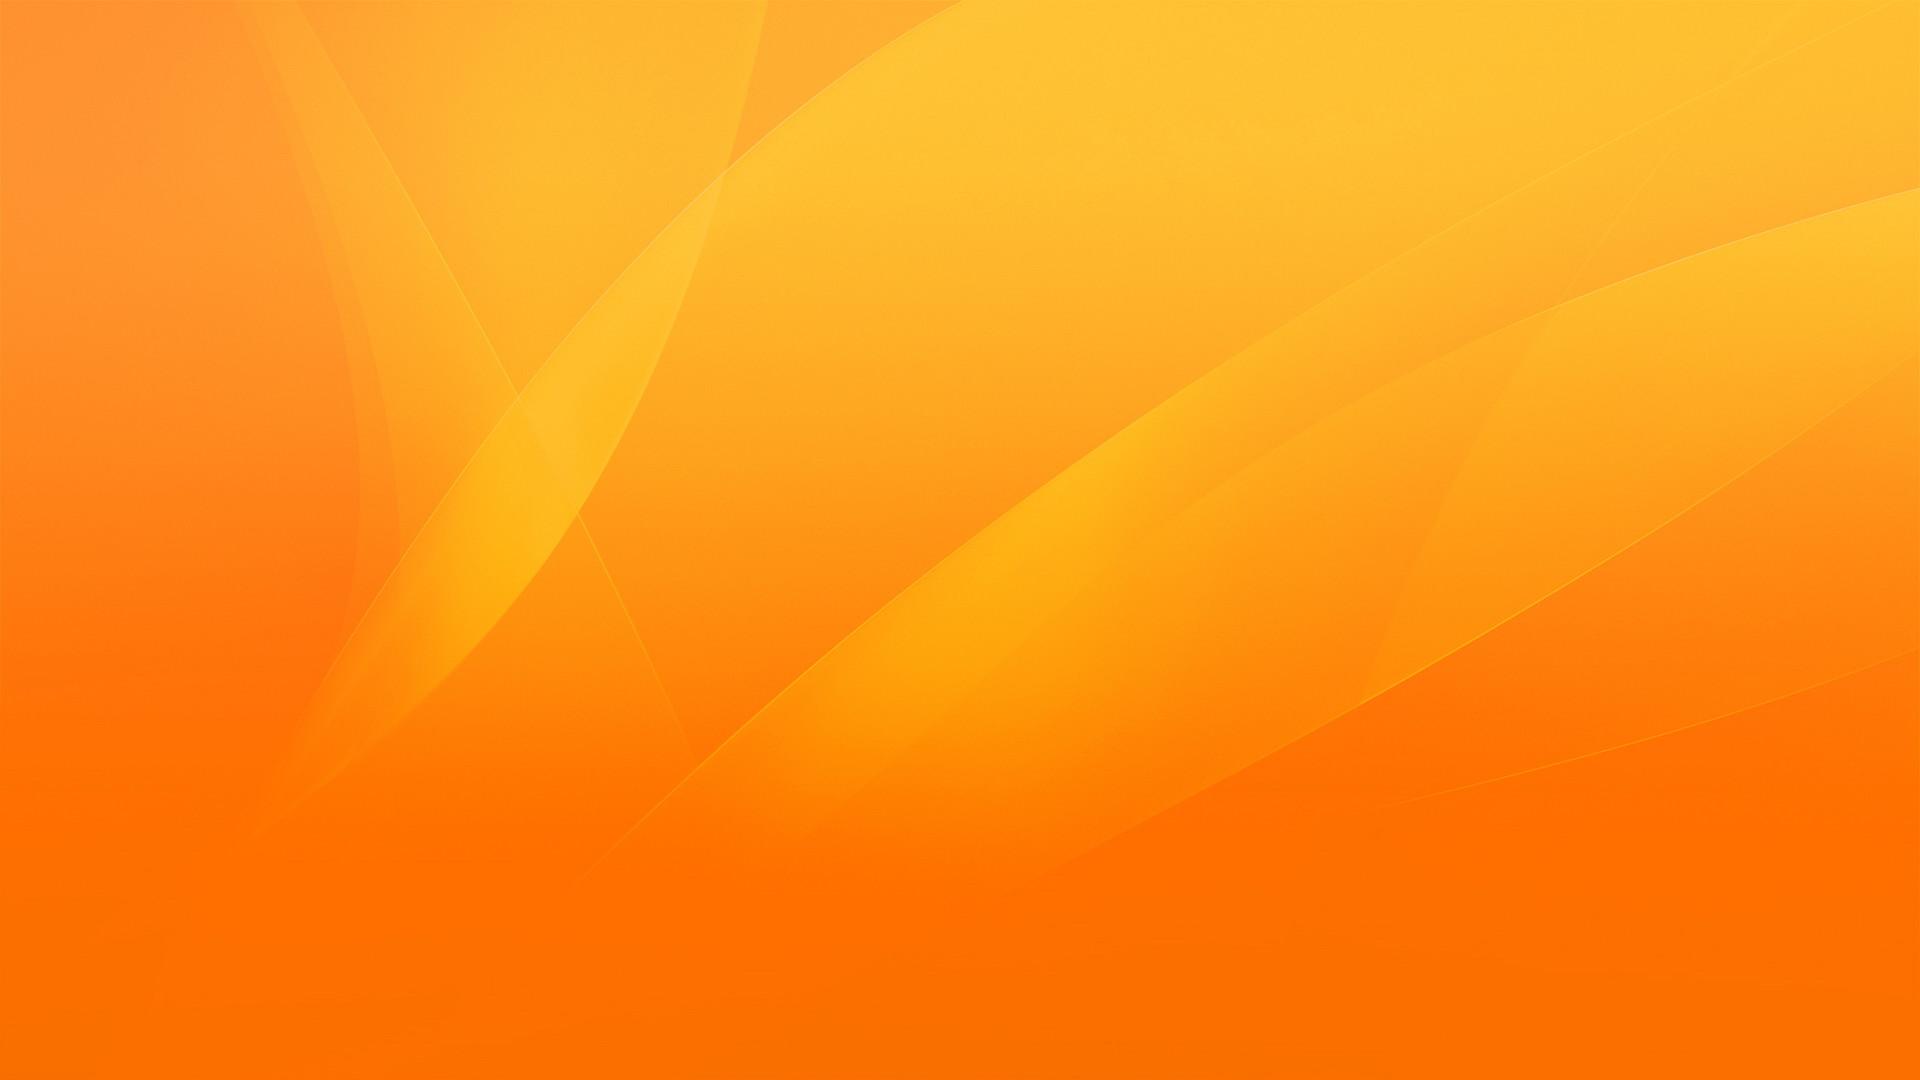 Res: 1920x1080, Orange Wallpaper